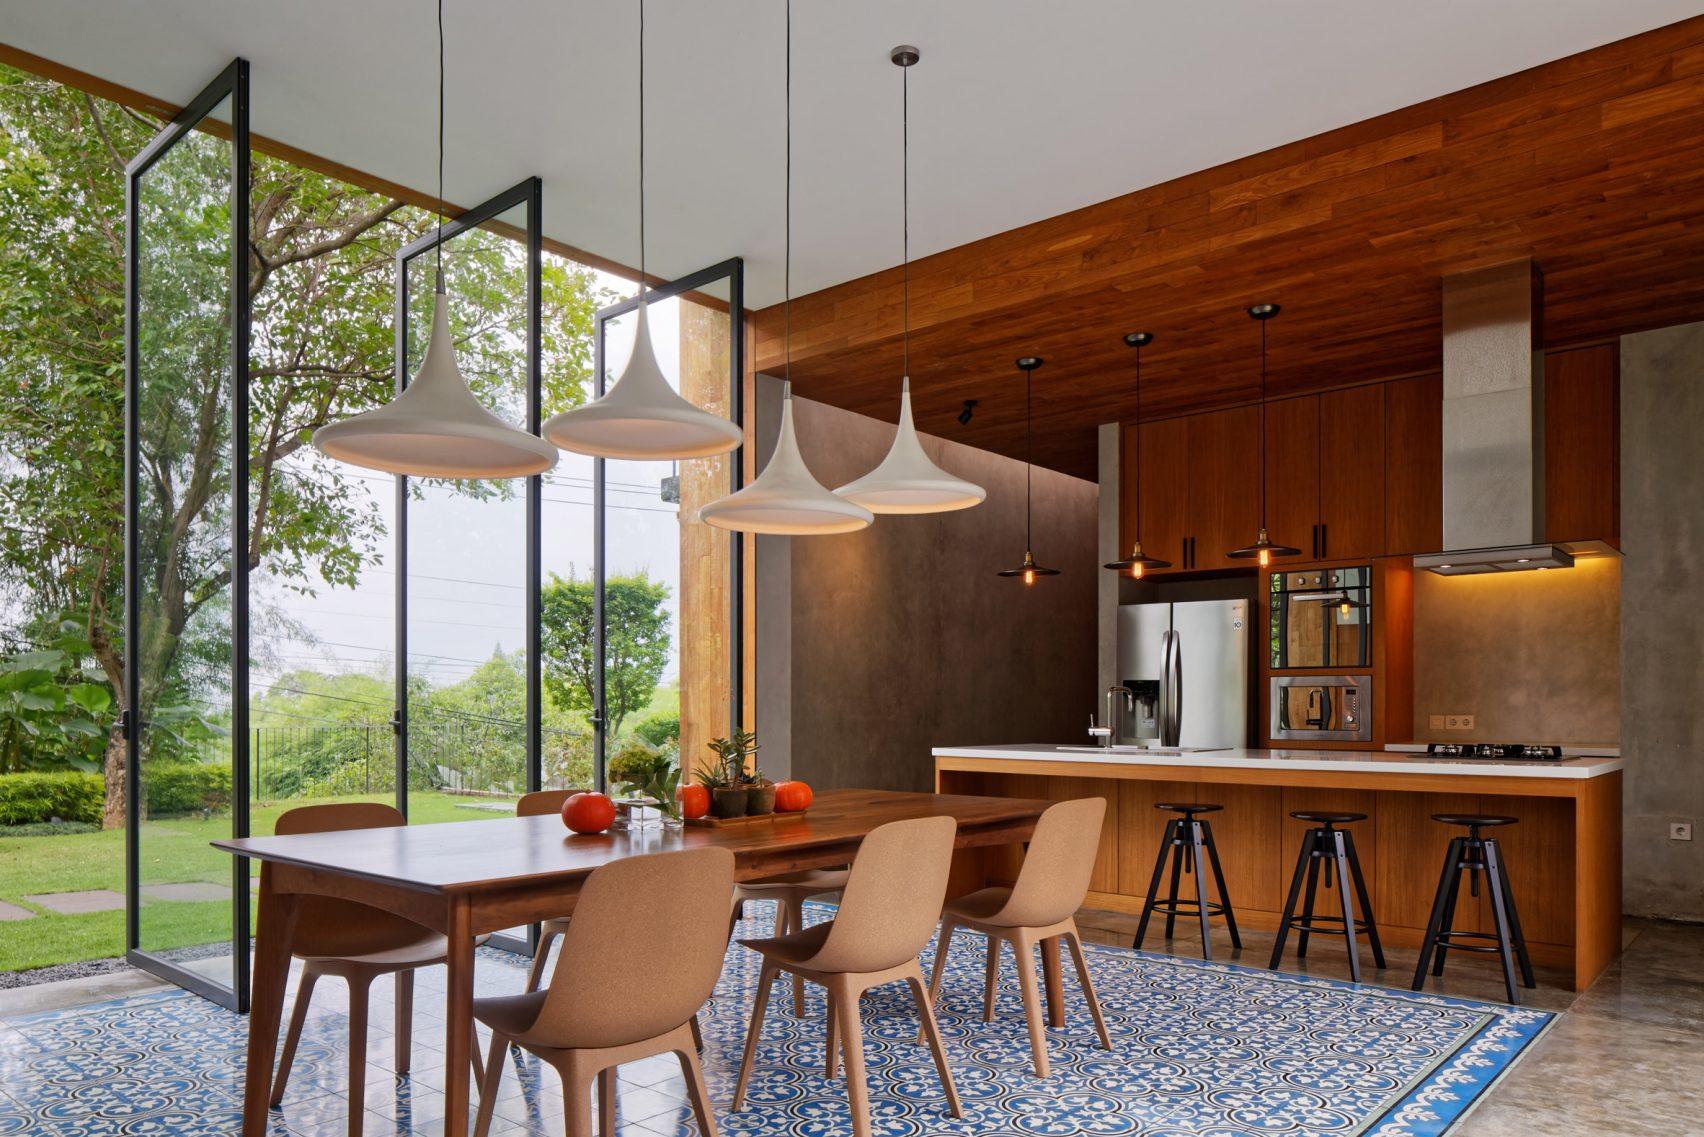 house-inside-outside-tamara-wibowo-architecture-residential-indonesia_dezeen_2364_col_21-1704x1137.jpg